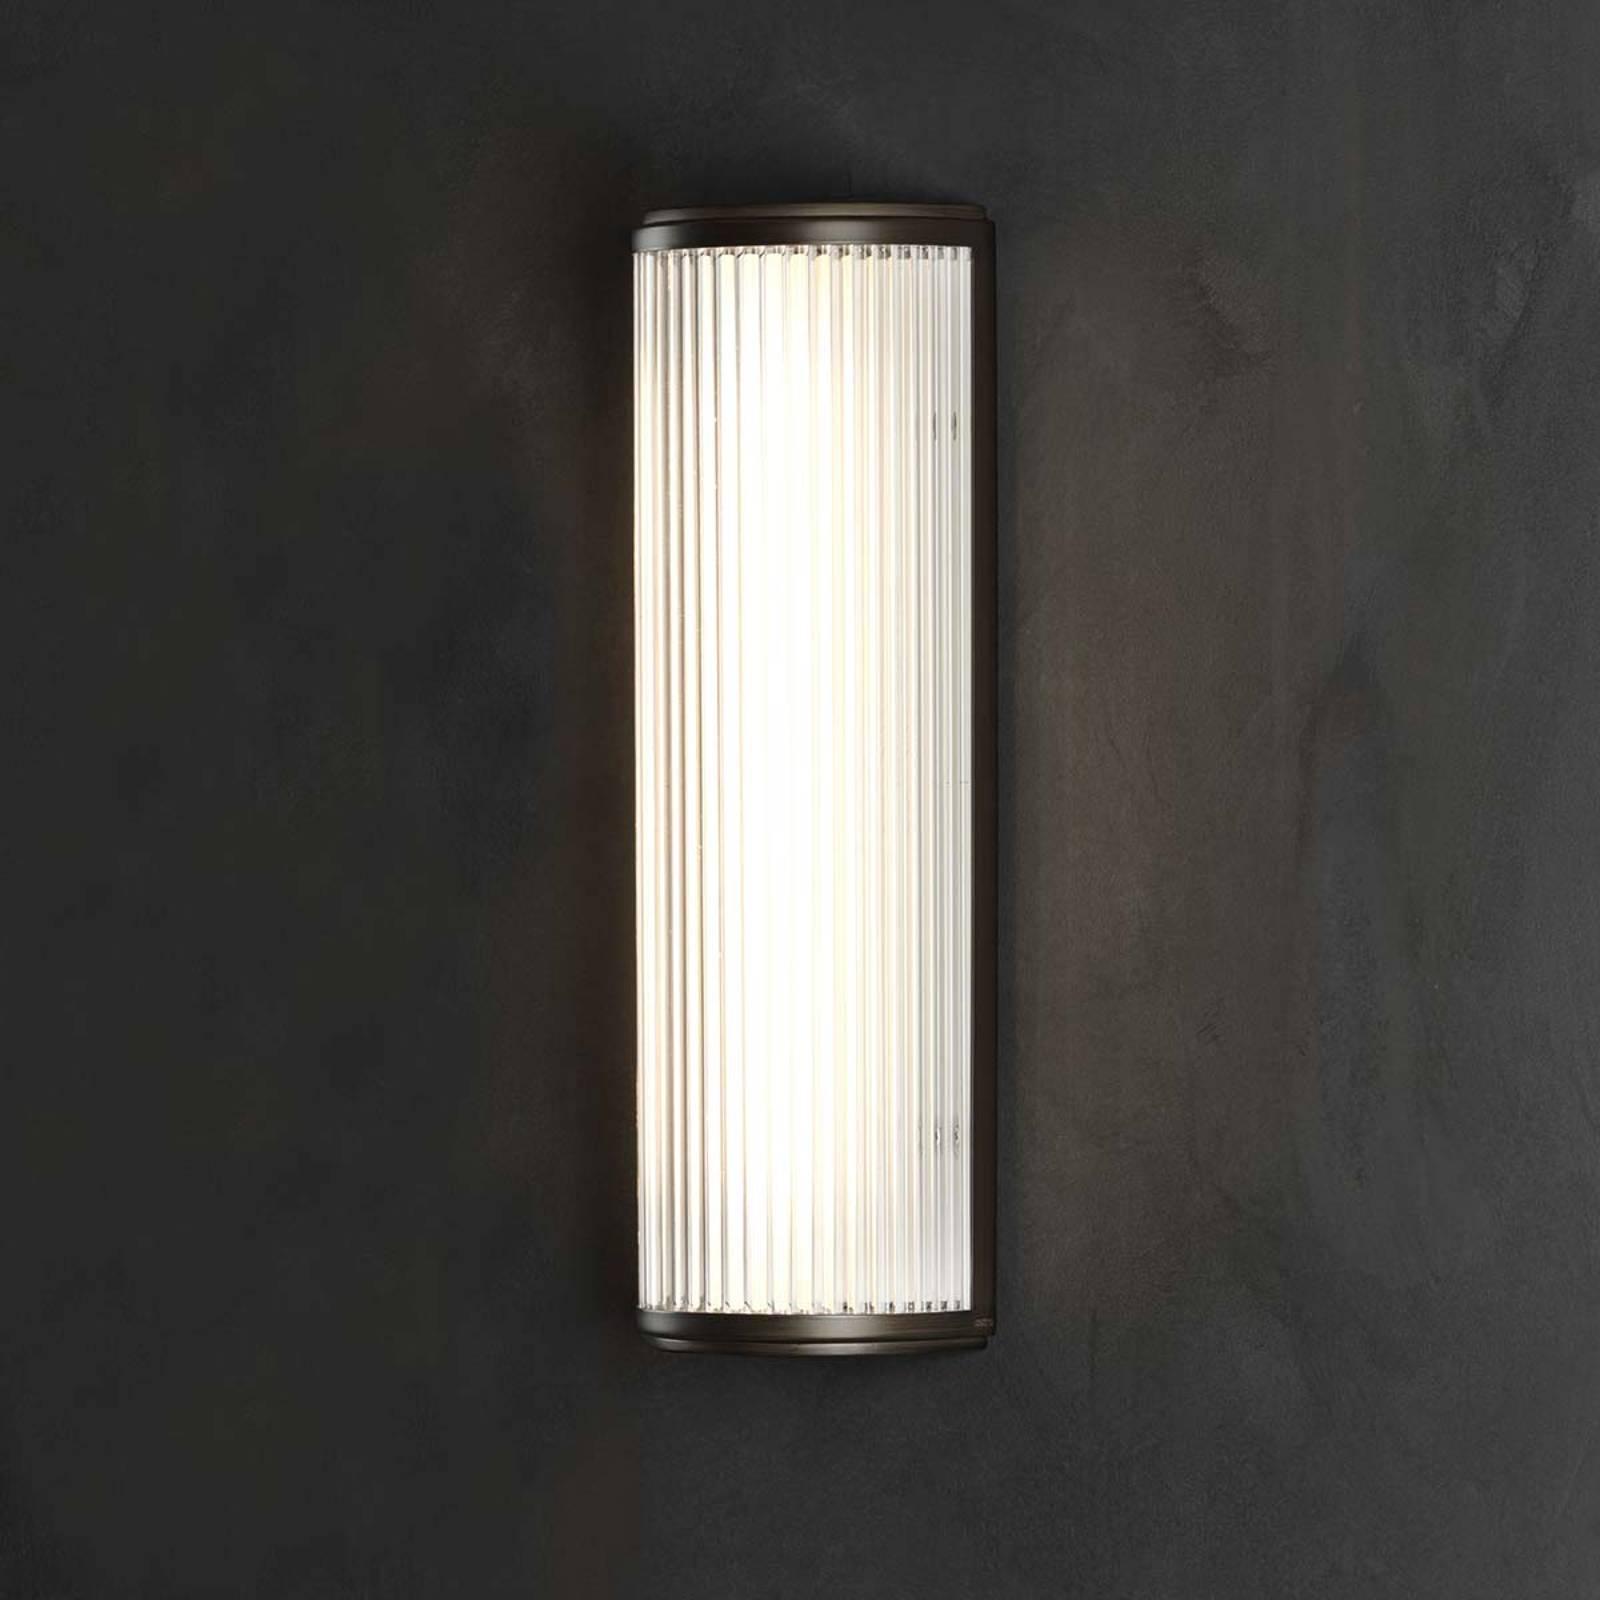 LED wandlamp Versailles met fijne ribbeling